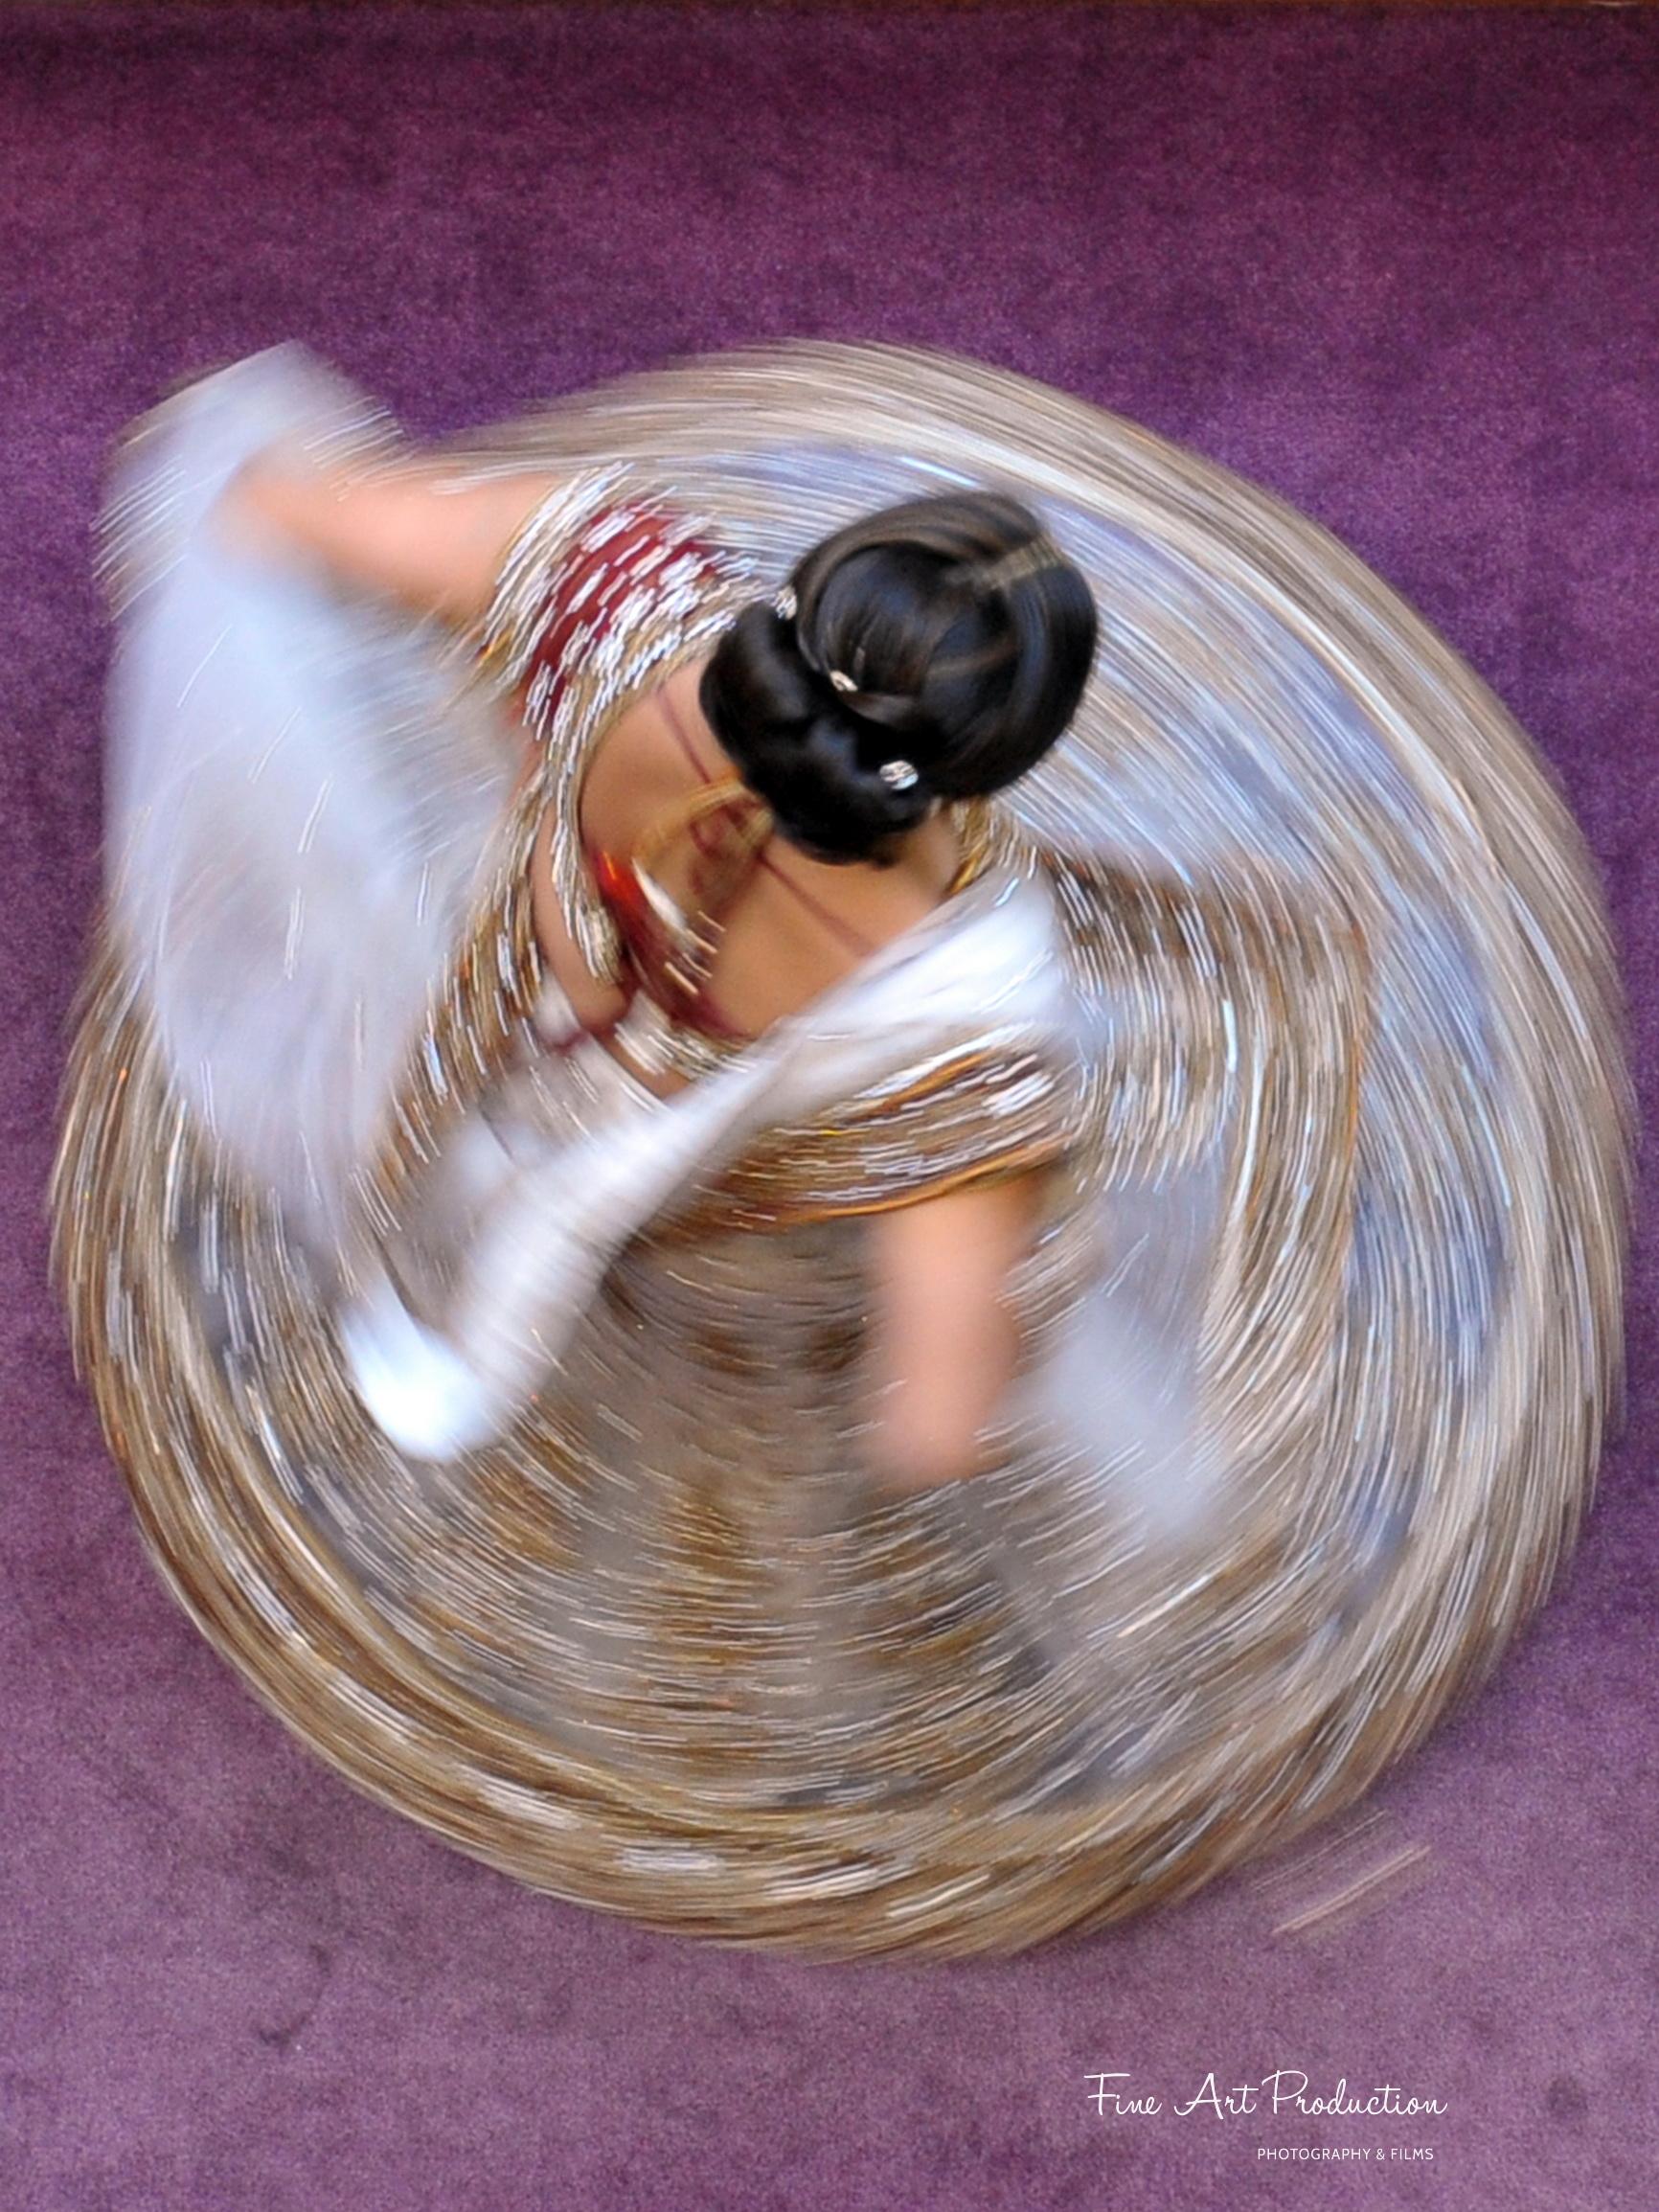 india-wedding-photographer-fine-art-production-chirali-amish-thakkar_0001